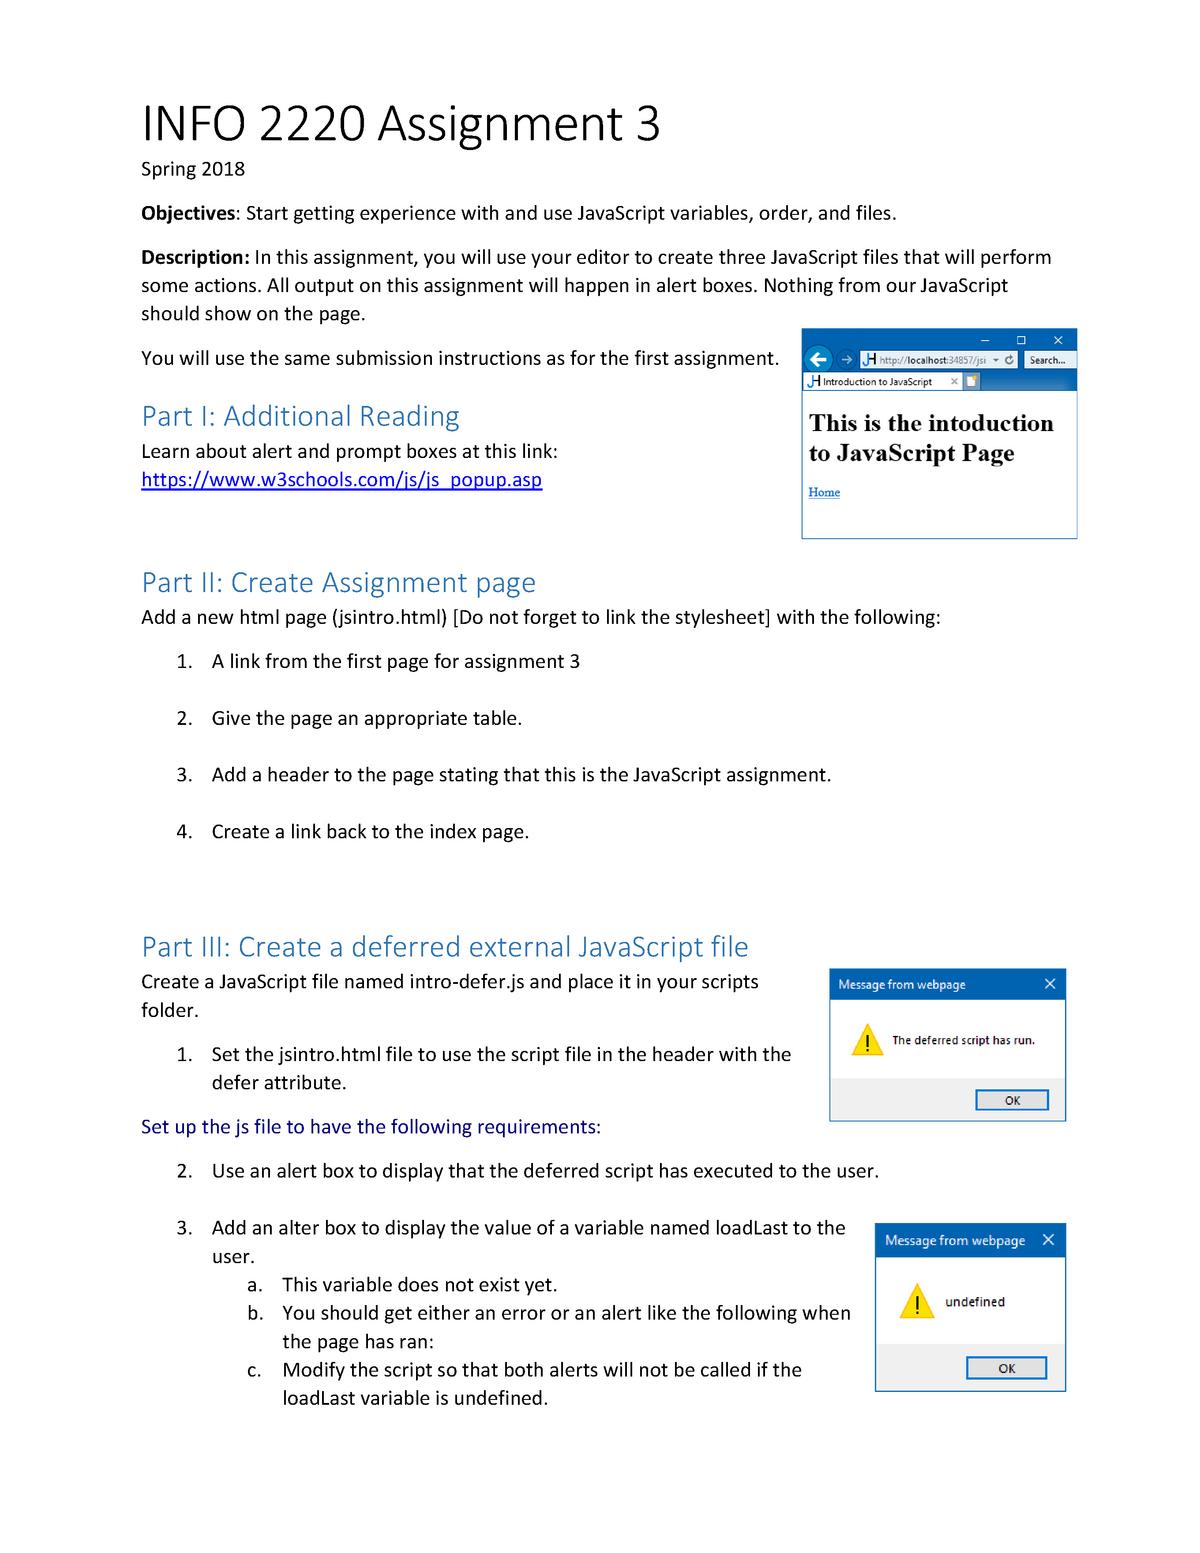 Assignment 3 - Lecture notes 3 - INFO 2220: Web Development:Client